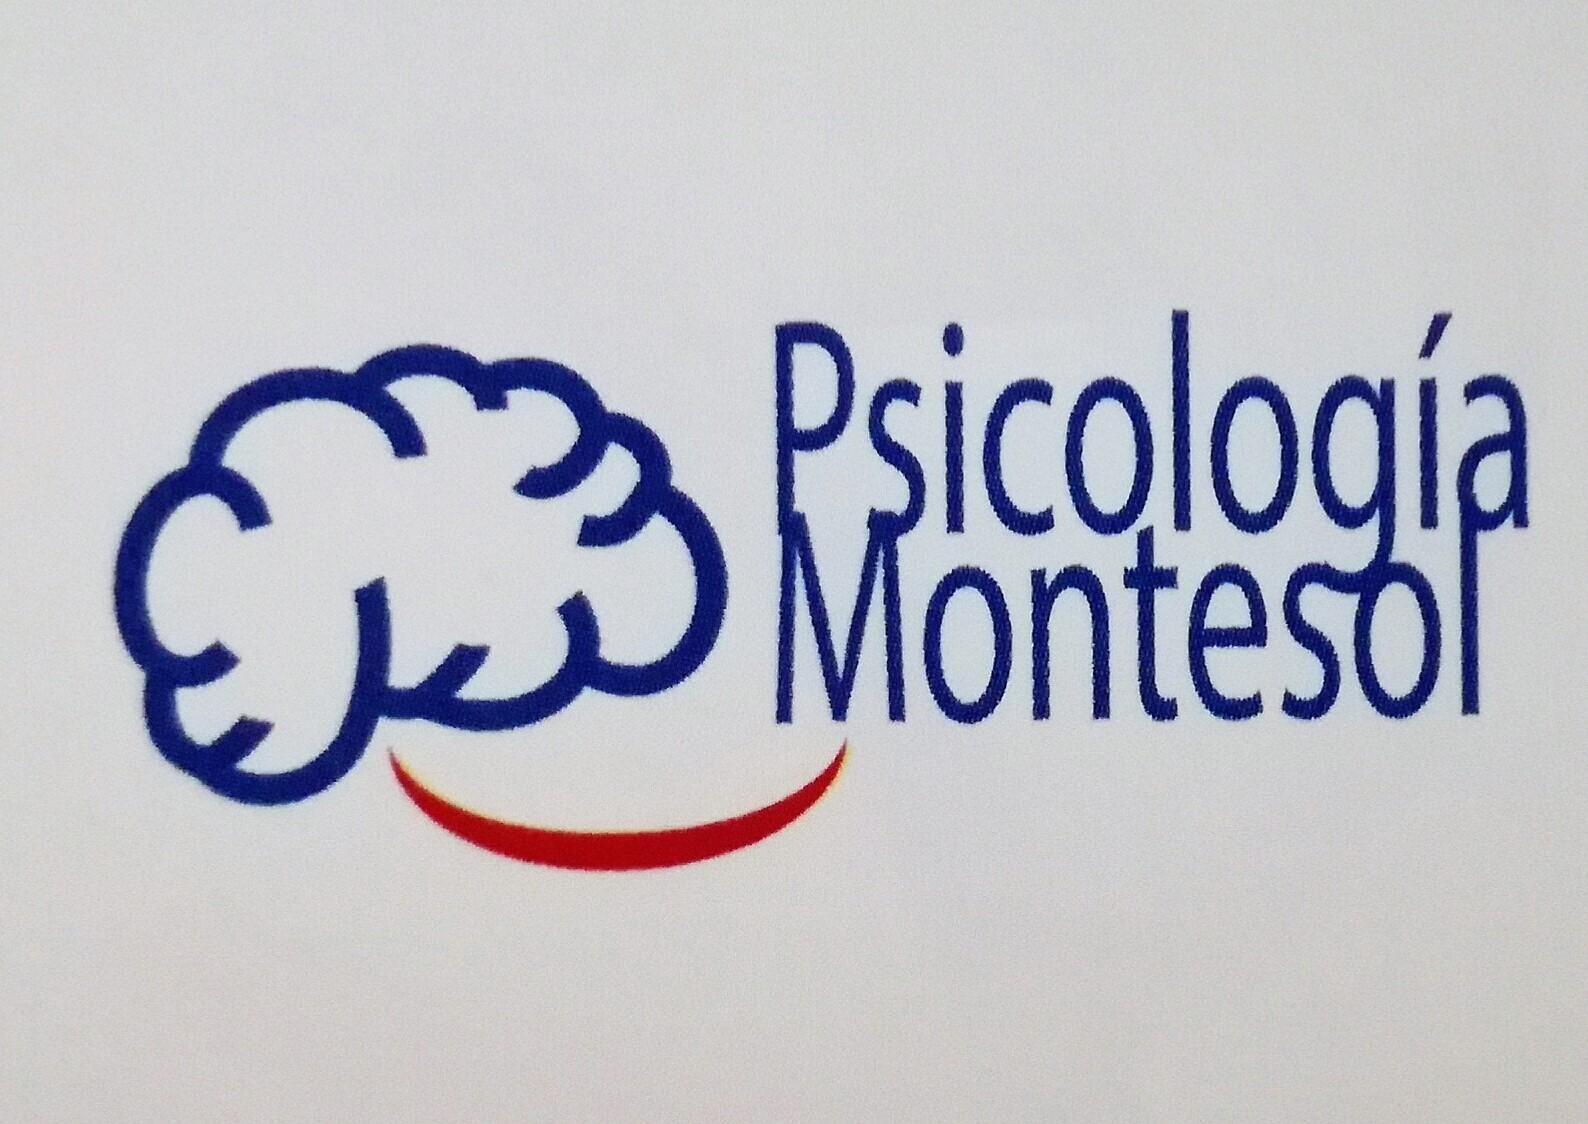 ESPAÑA PSICOLOGIA CACERES MONTESOL CENTRO